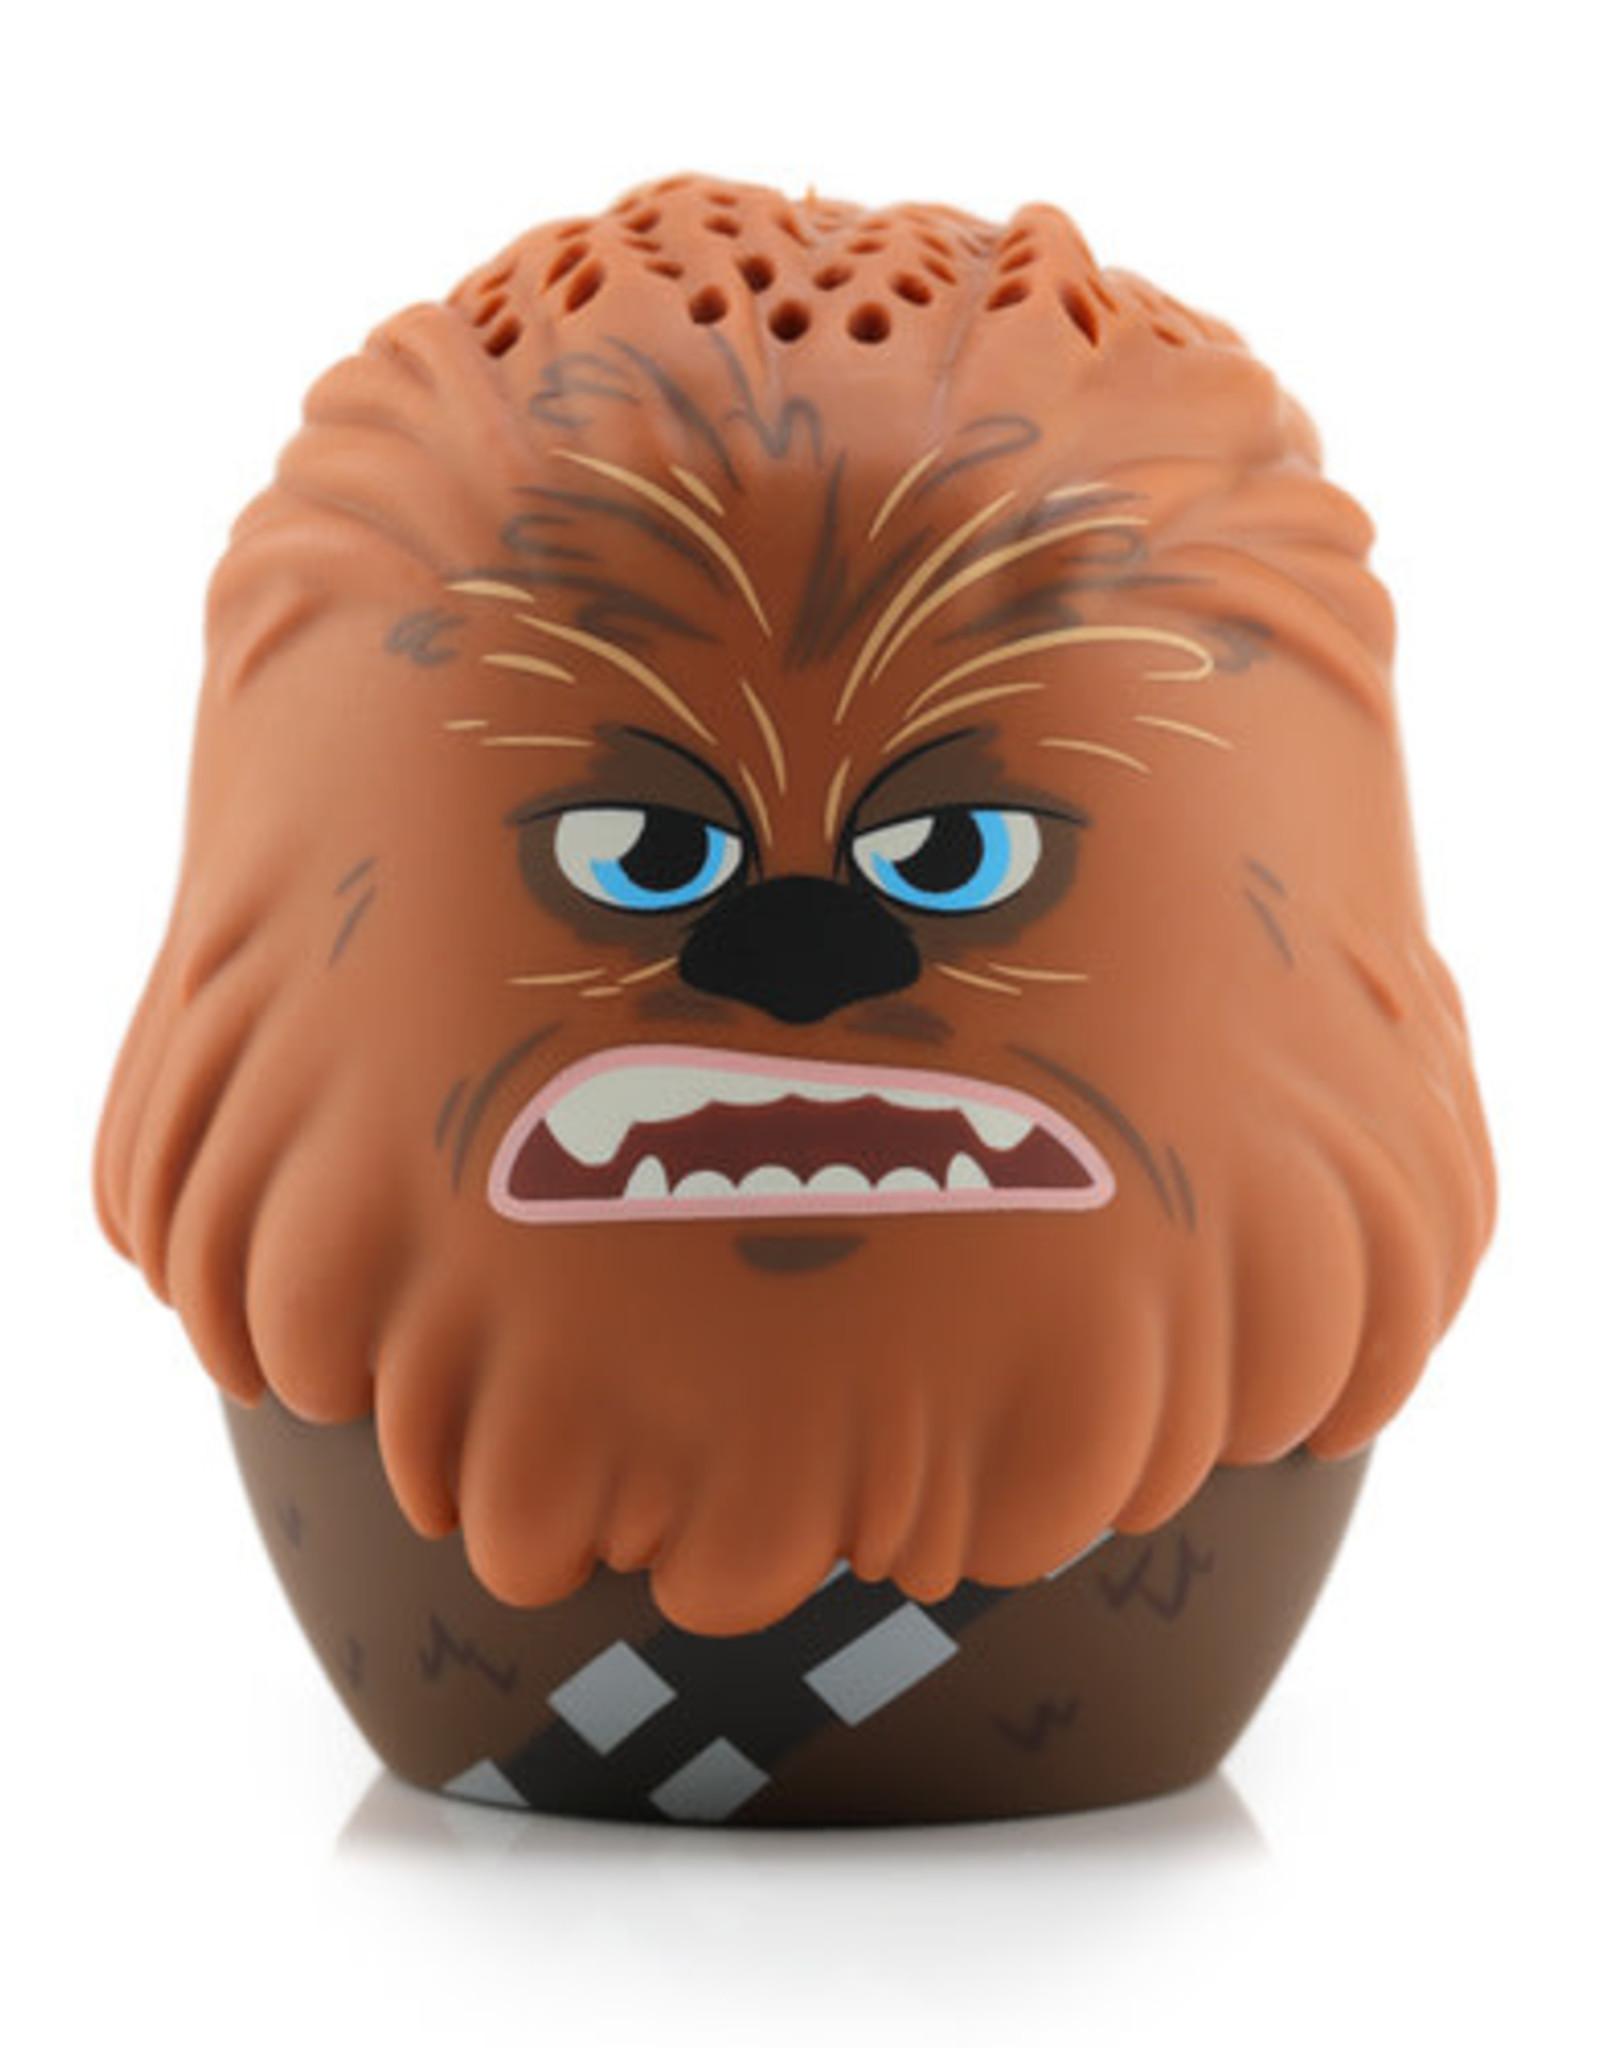 Bitty Boomers Chewbacca  Bluetooth Speaker